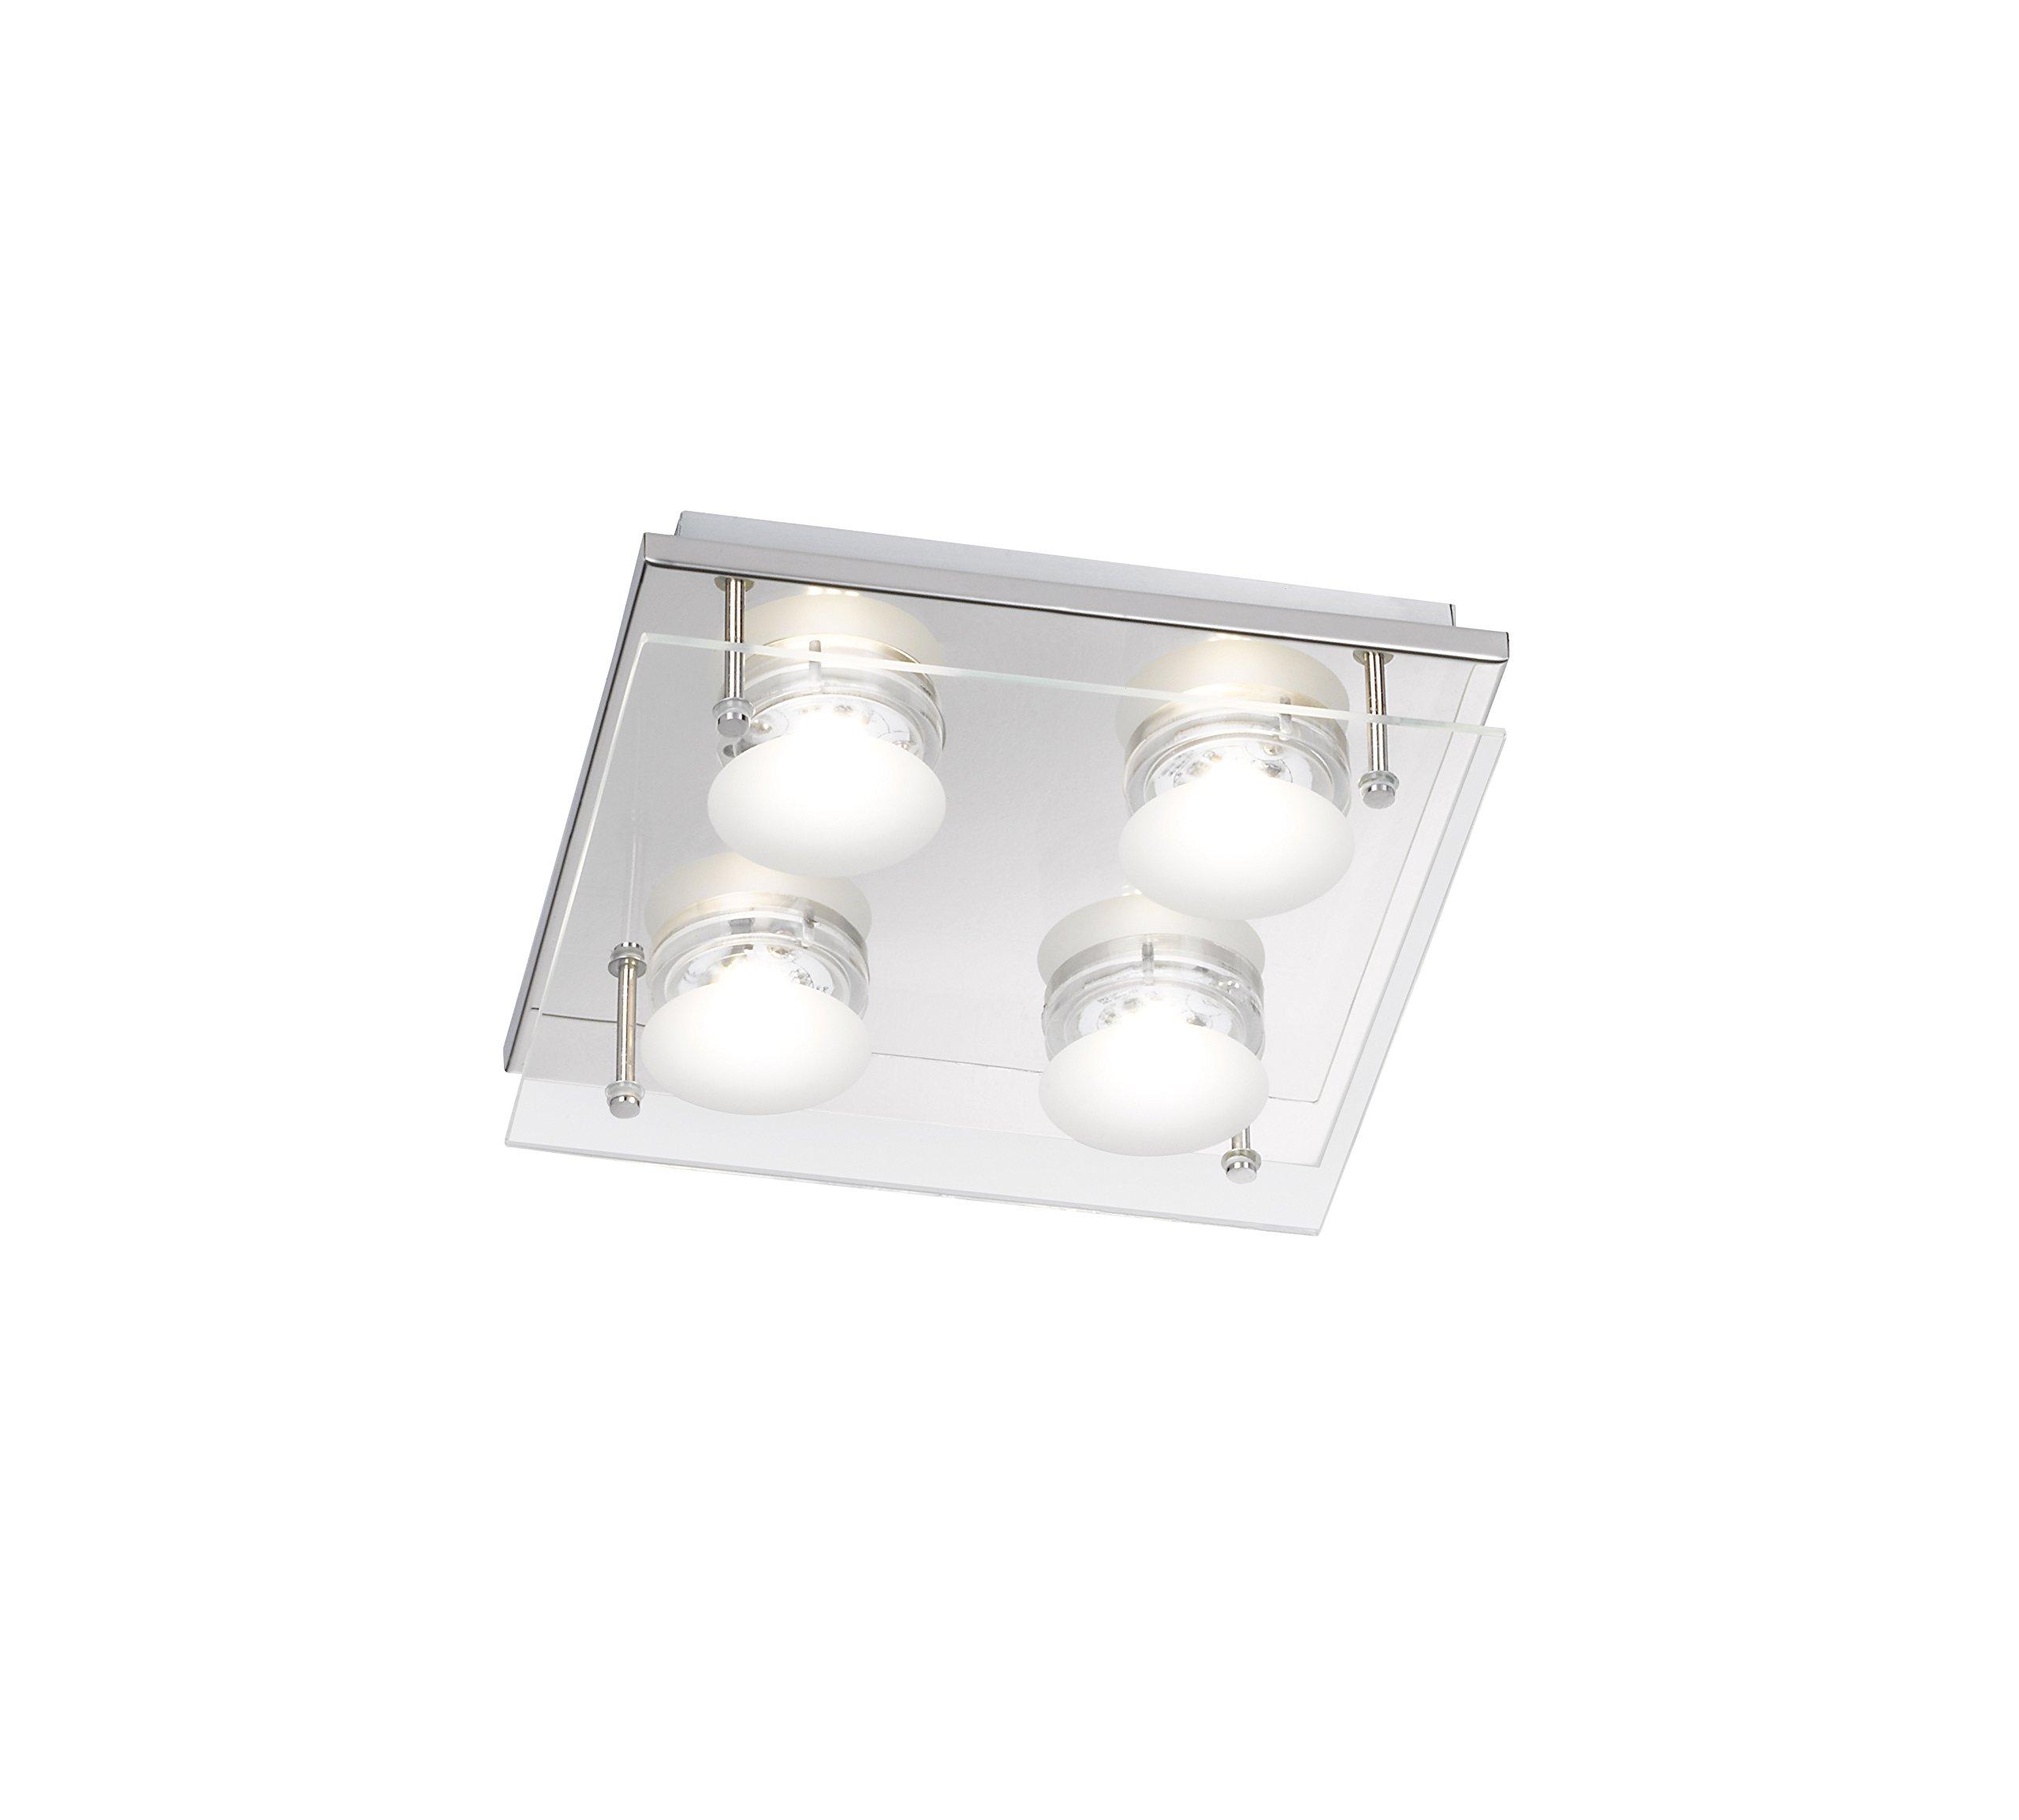 WOFI Lampada da Soffitto Integriert, 22 W, Silber, Transparent, 22 x 22 x 5.5 cm